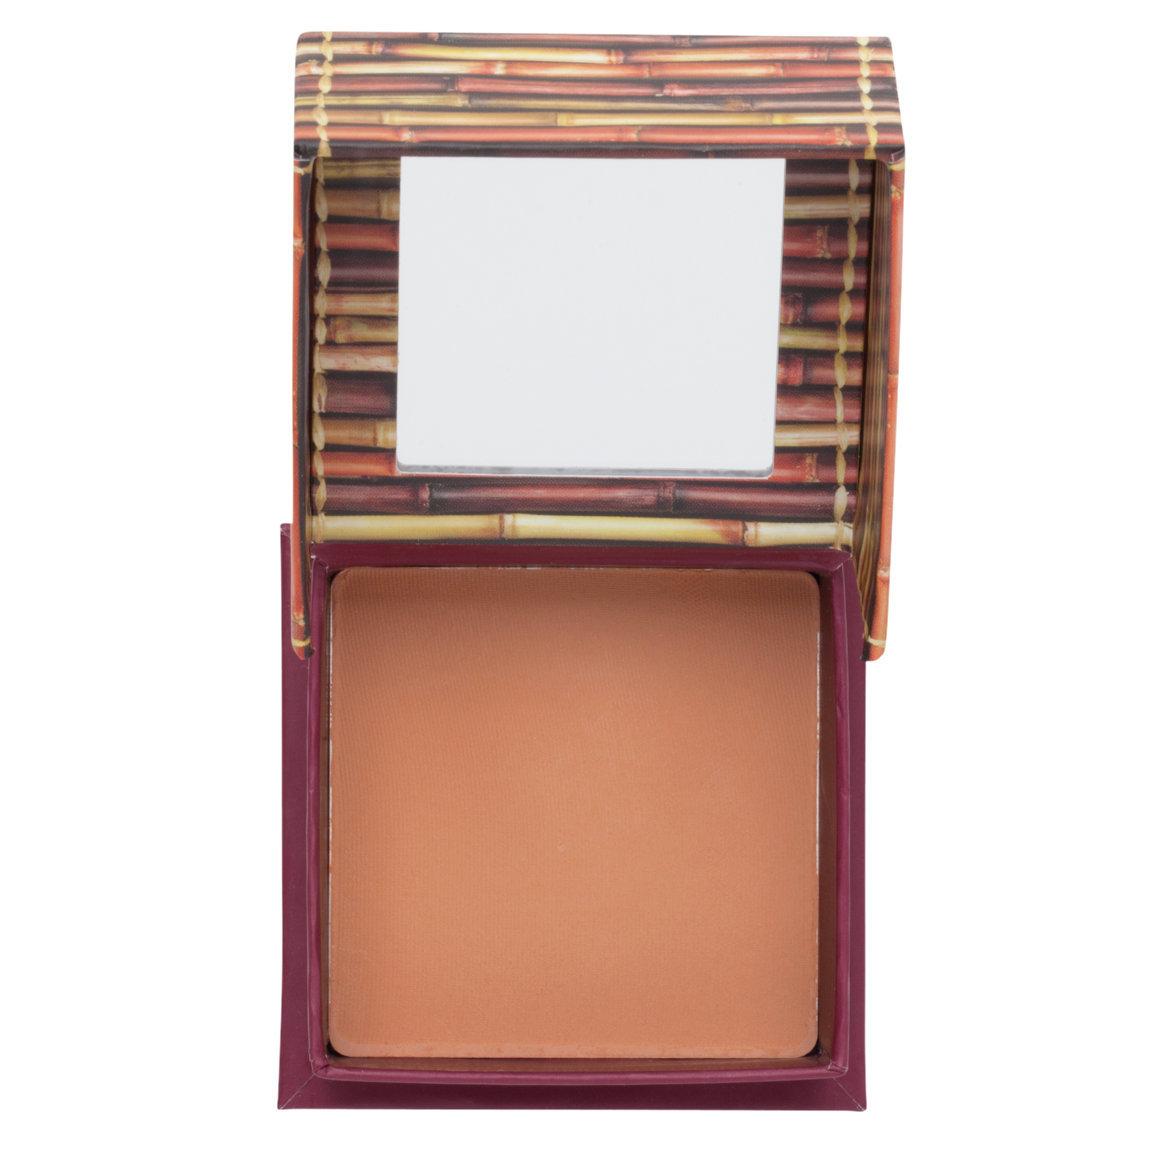 Benefit Cosmetics Hoola Matte Bronzer Original - Medium product swatch.